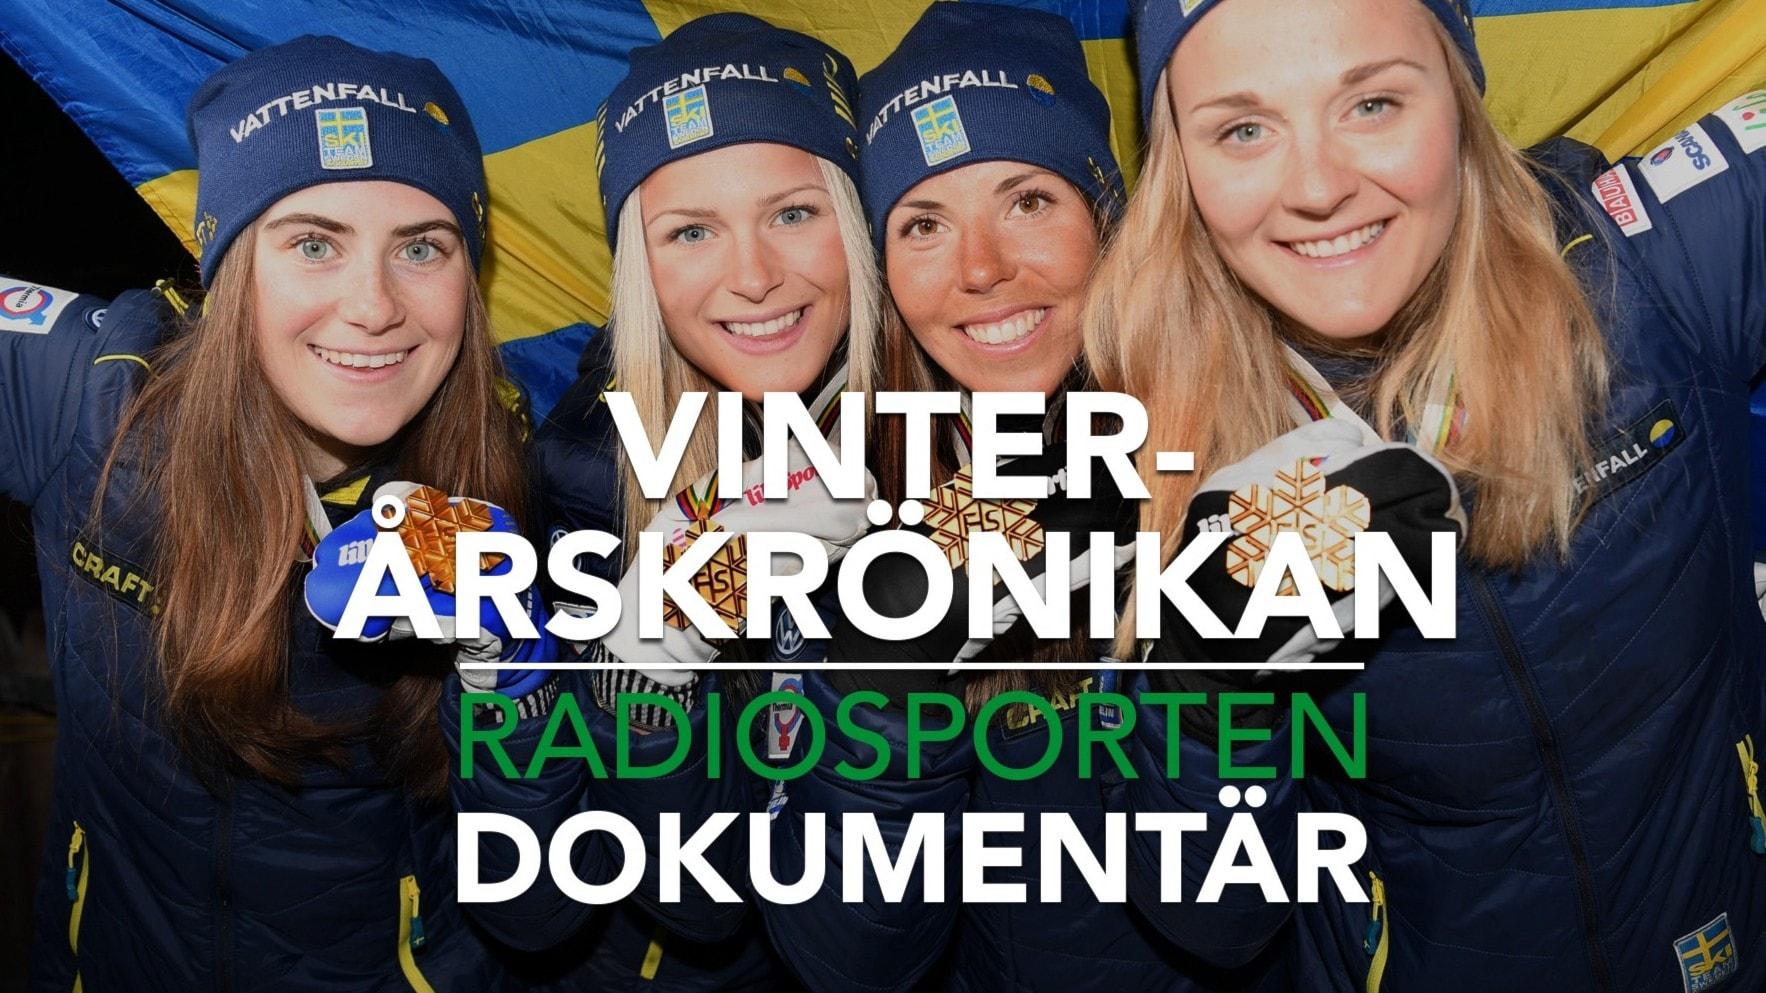 Special: Vinterårskrönikan 2019